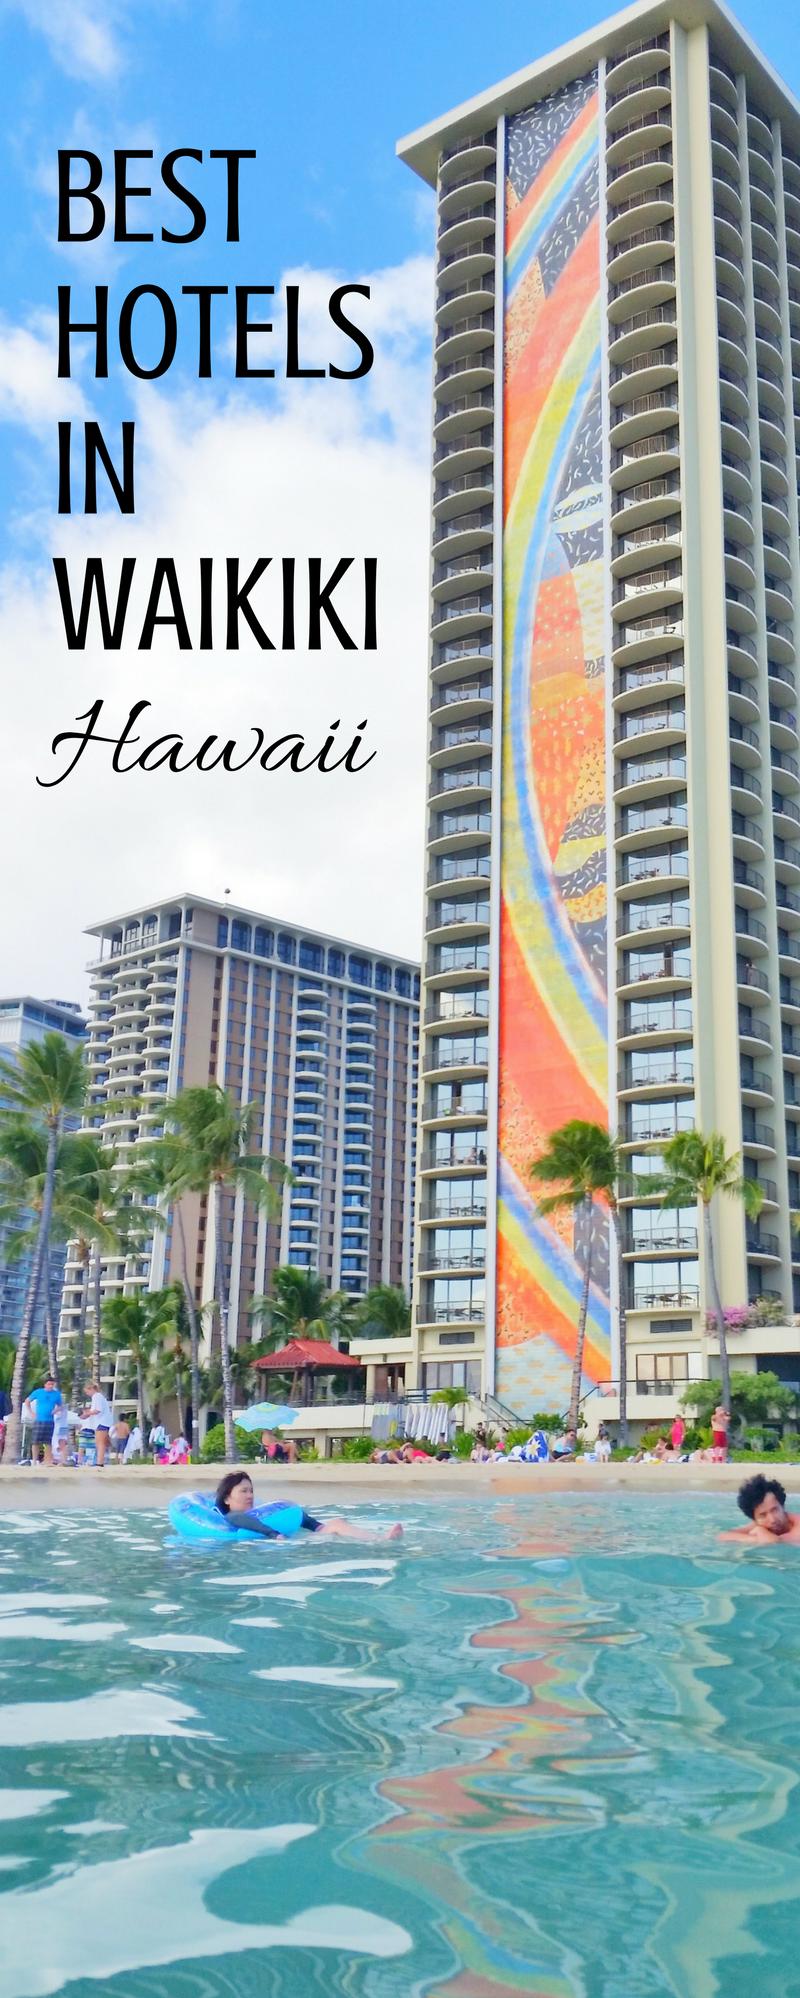 Best Waikiki Hotels Rainbow Tower At Hilton Hawaiian Village Beach Resorts Oahu Hawaii Honolulu Spas Pools Lagoons Boutique With